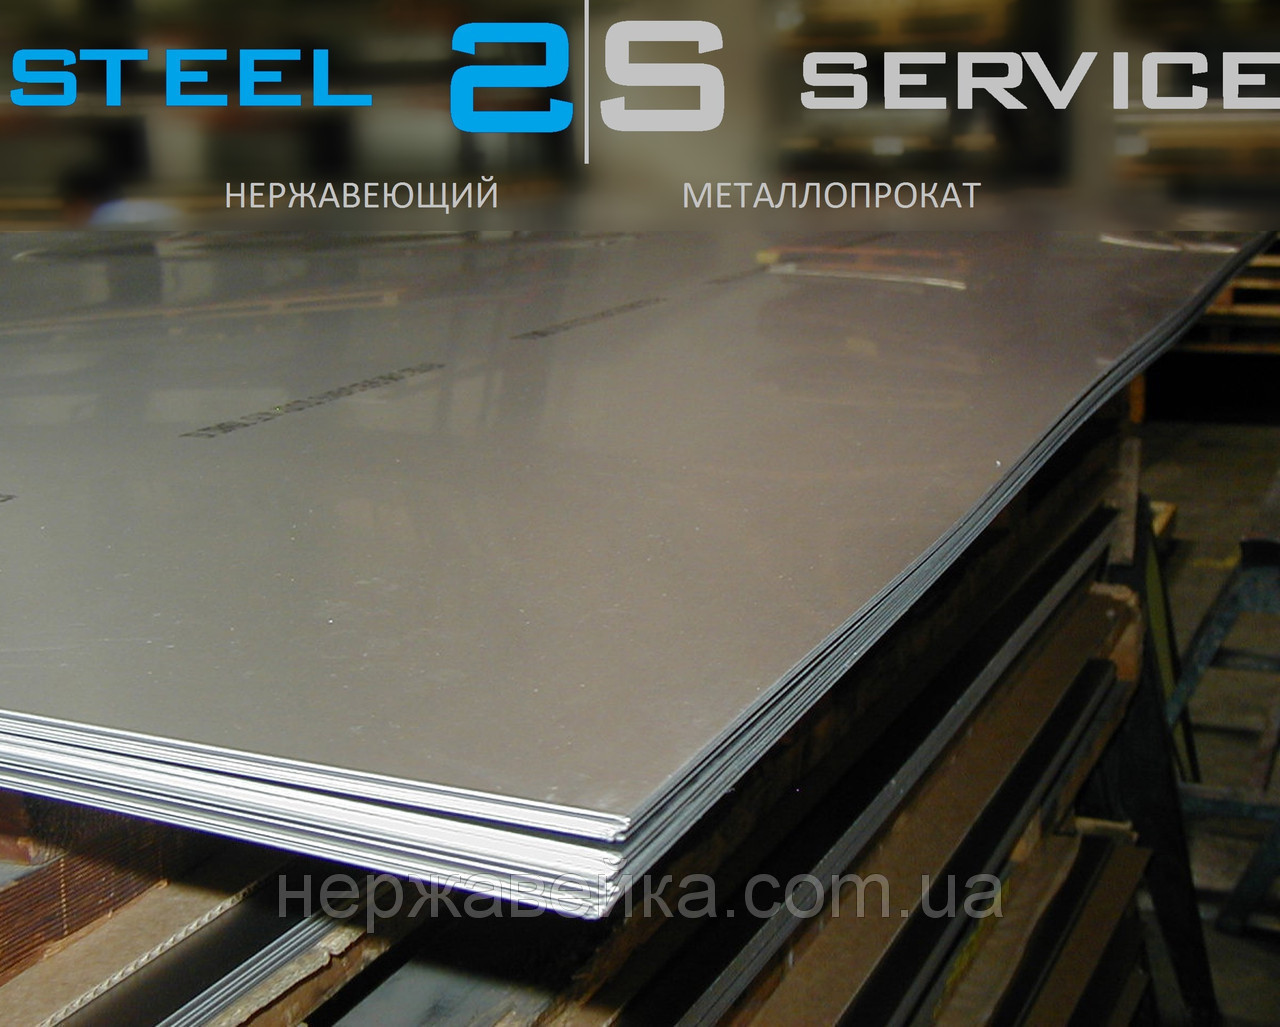 Нержавейка лист 14х1000х2000мм  AISI 316L(03Х17Н14М3) F1 - горячекатанный,  кислотостойкий